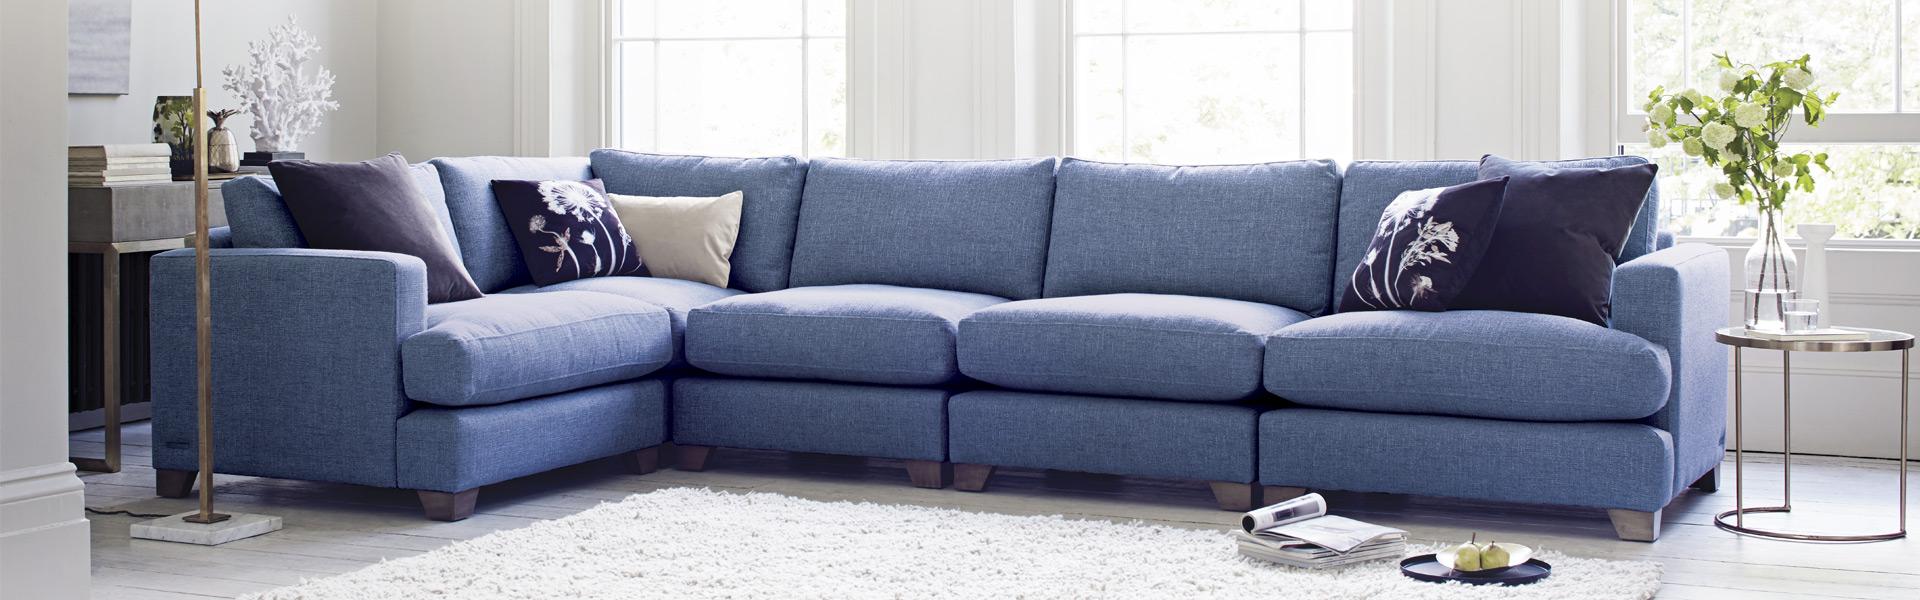 Lola Modular Sofa Range